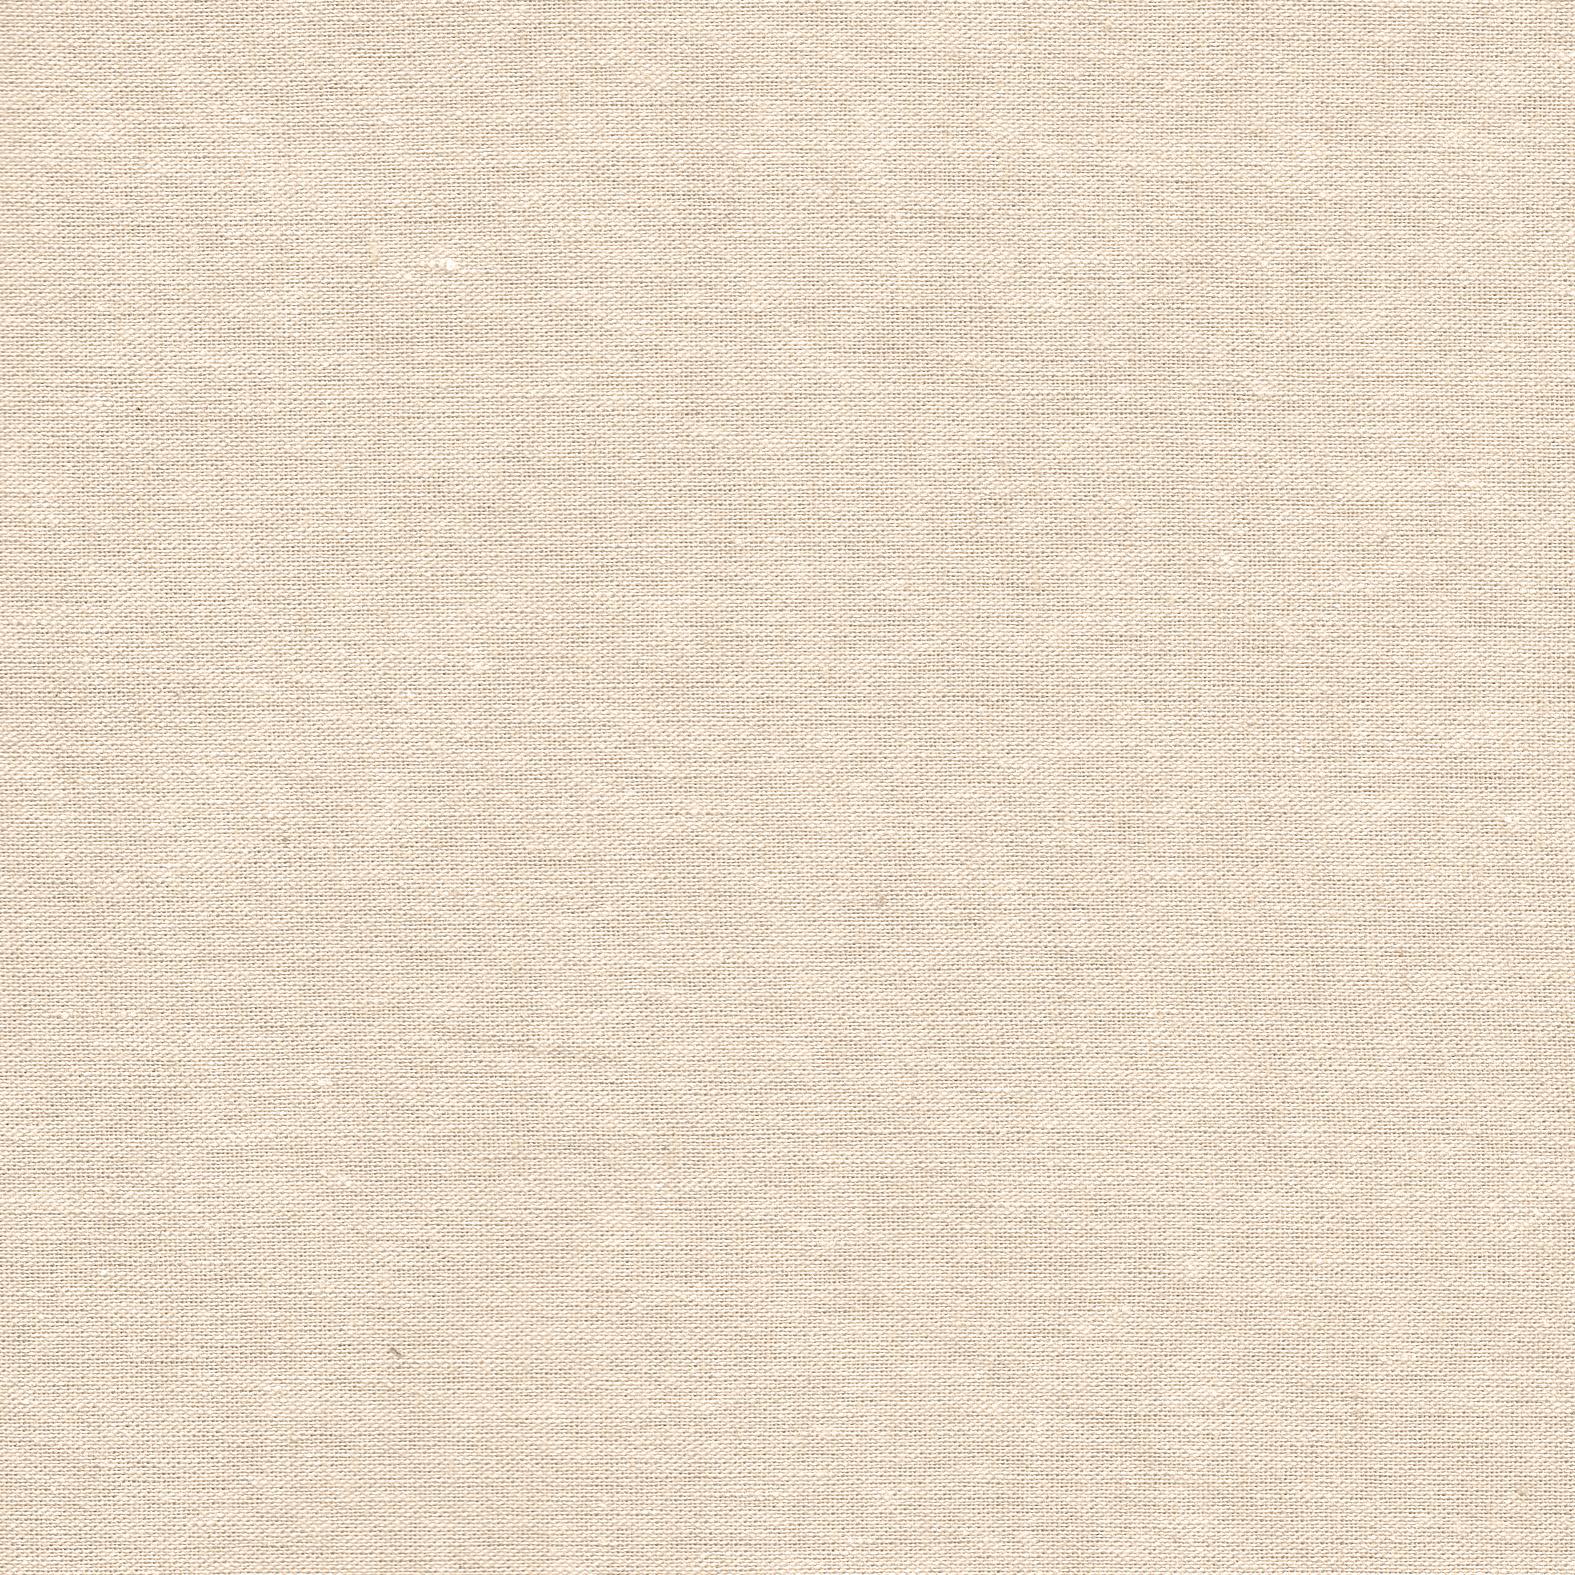 Robert Kaufman : Essex Yarn Dyed : Lingerie : 1/2 metre